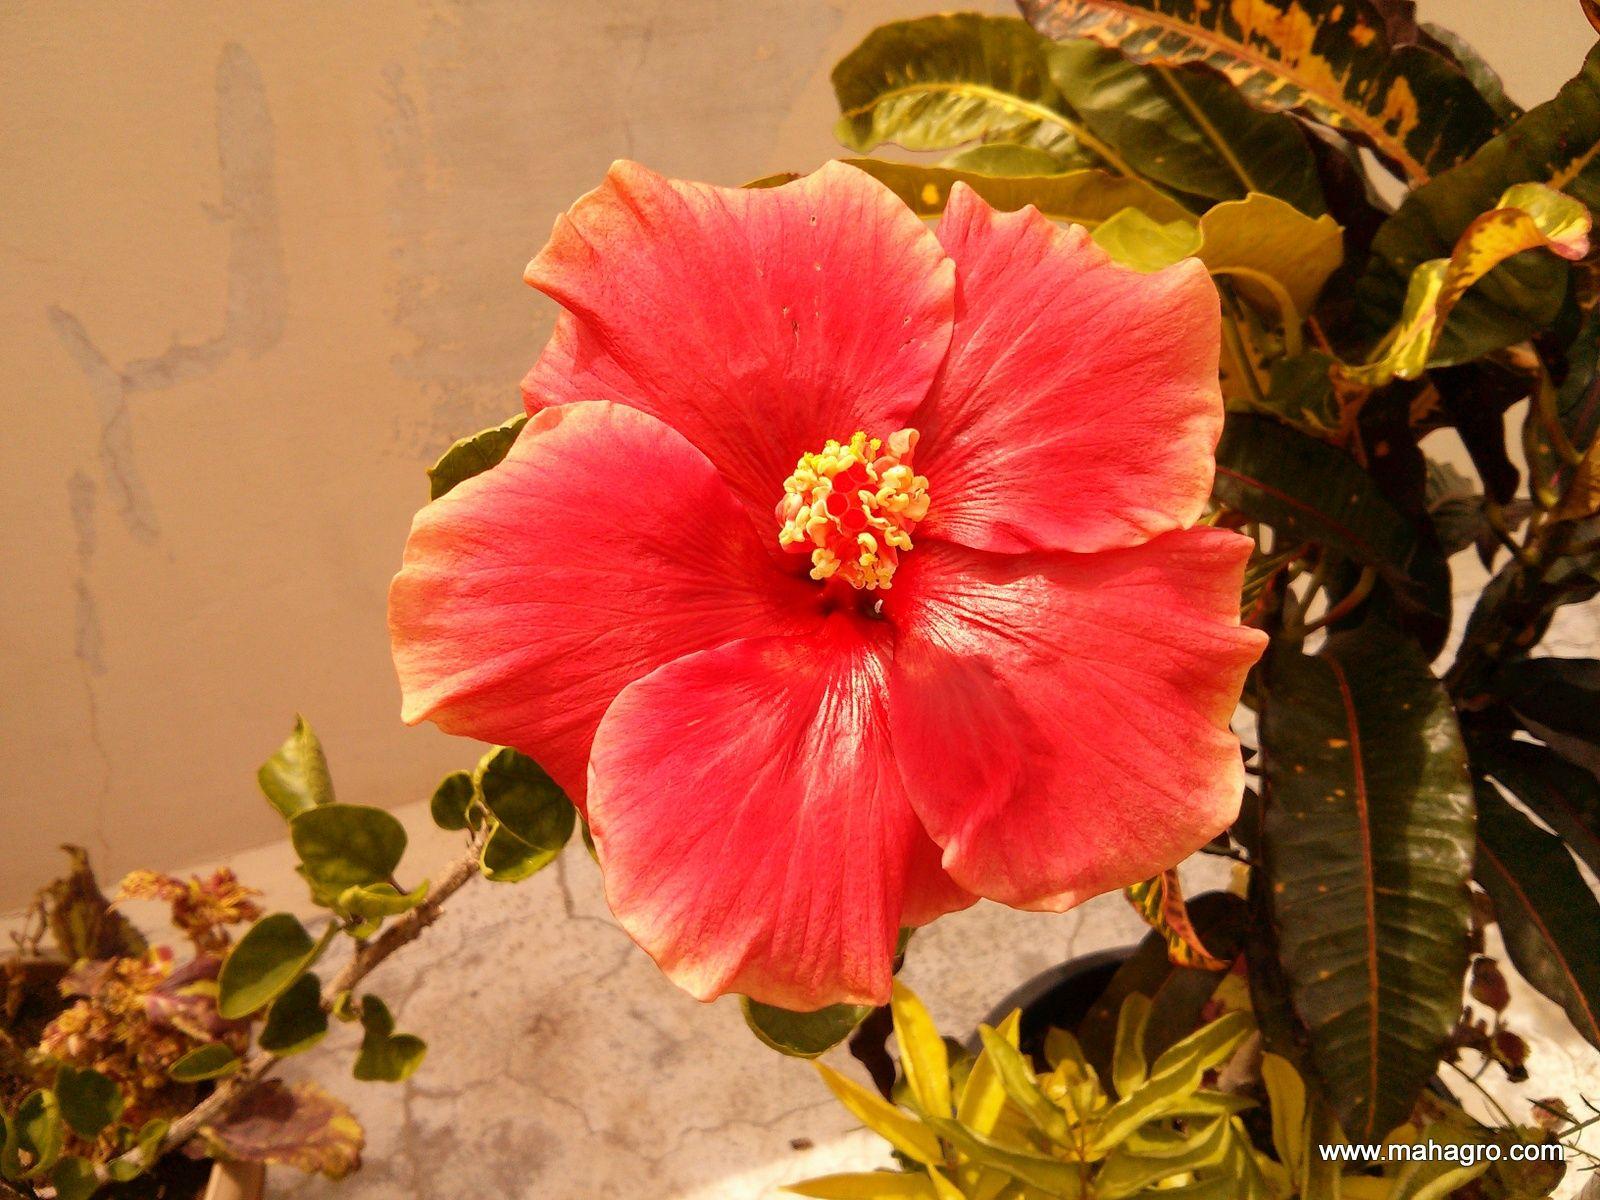 Hibiscus Flowers Organic Gardening Eco Farming Soil Garden Organic Fertilizer Organic Growing Flowers